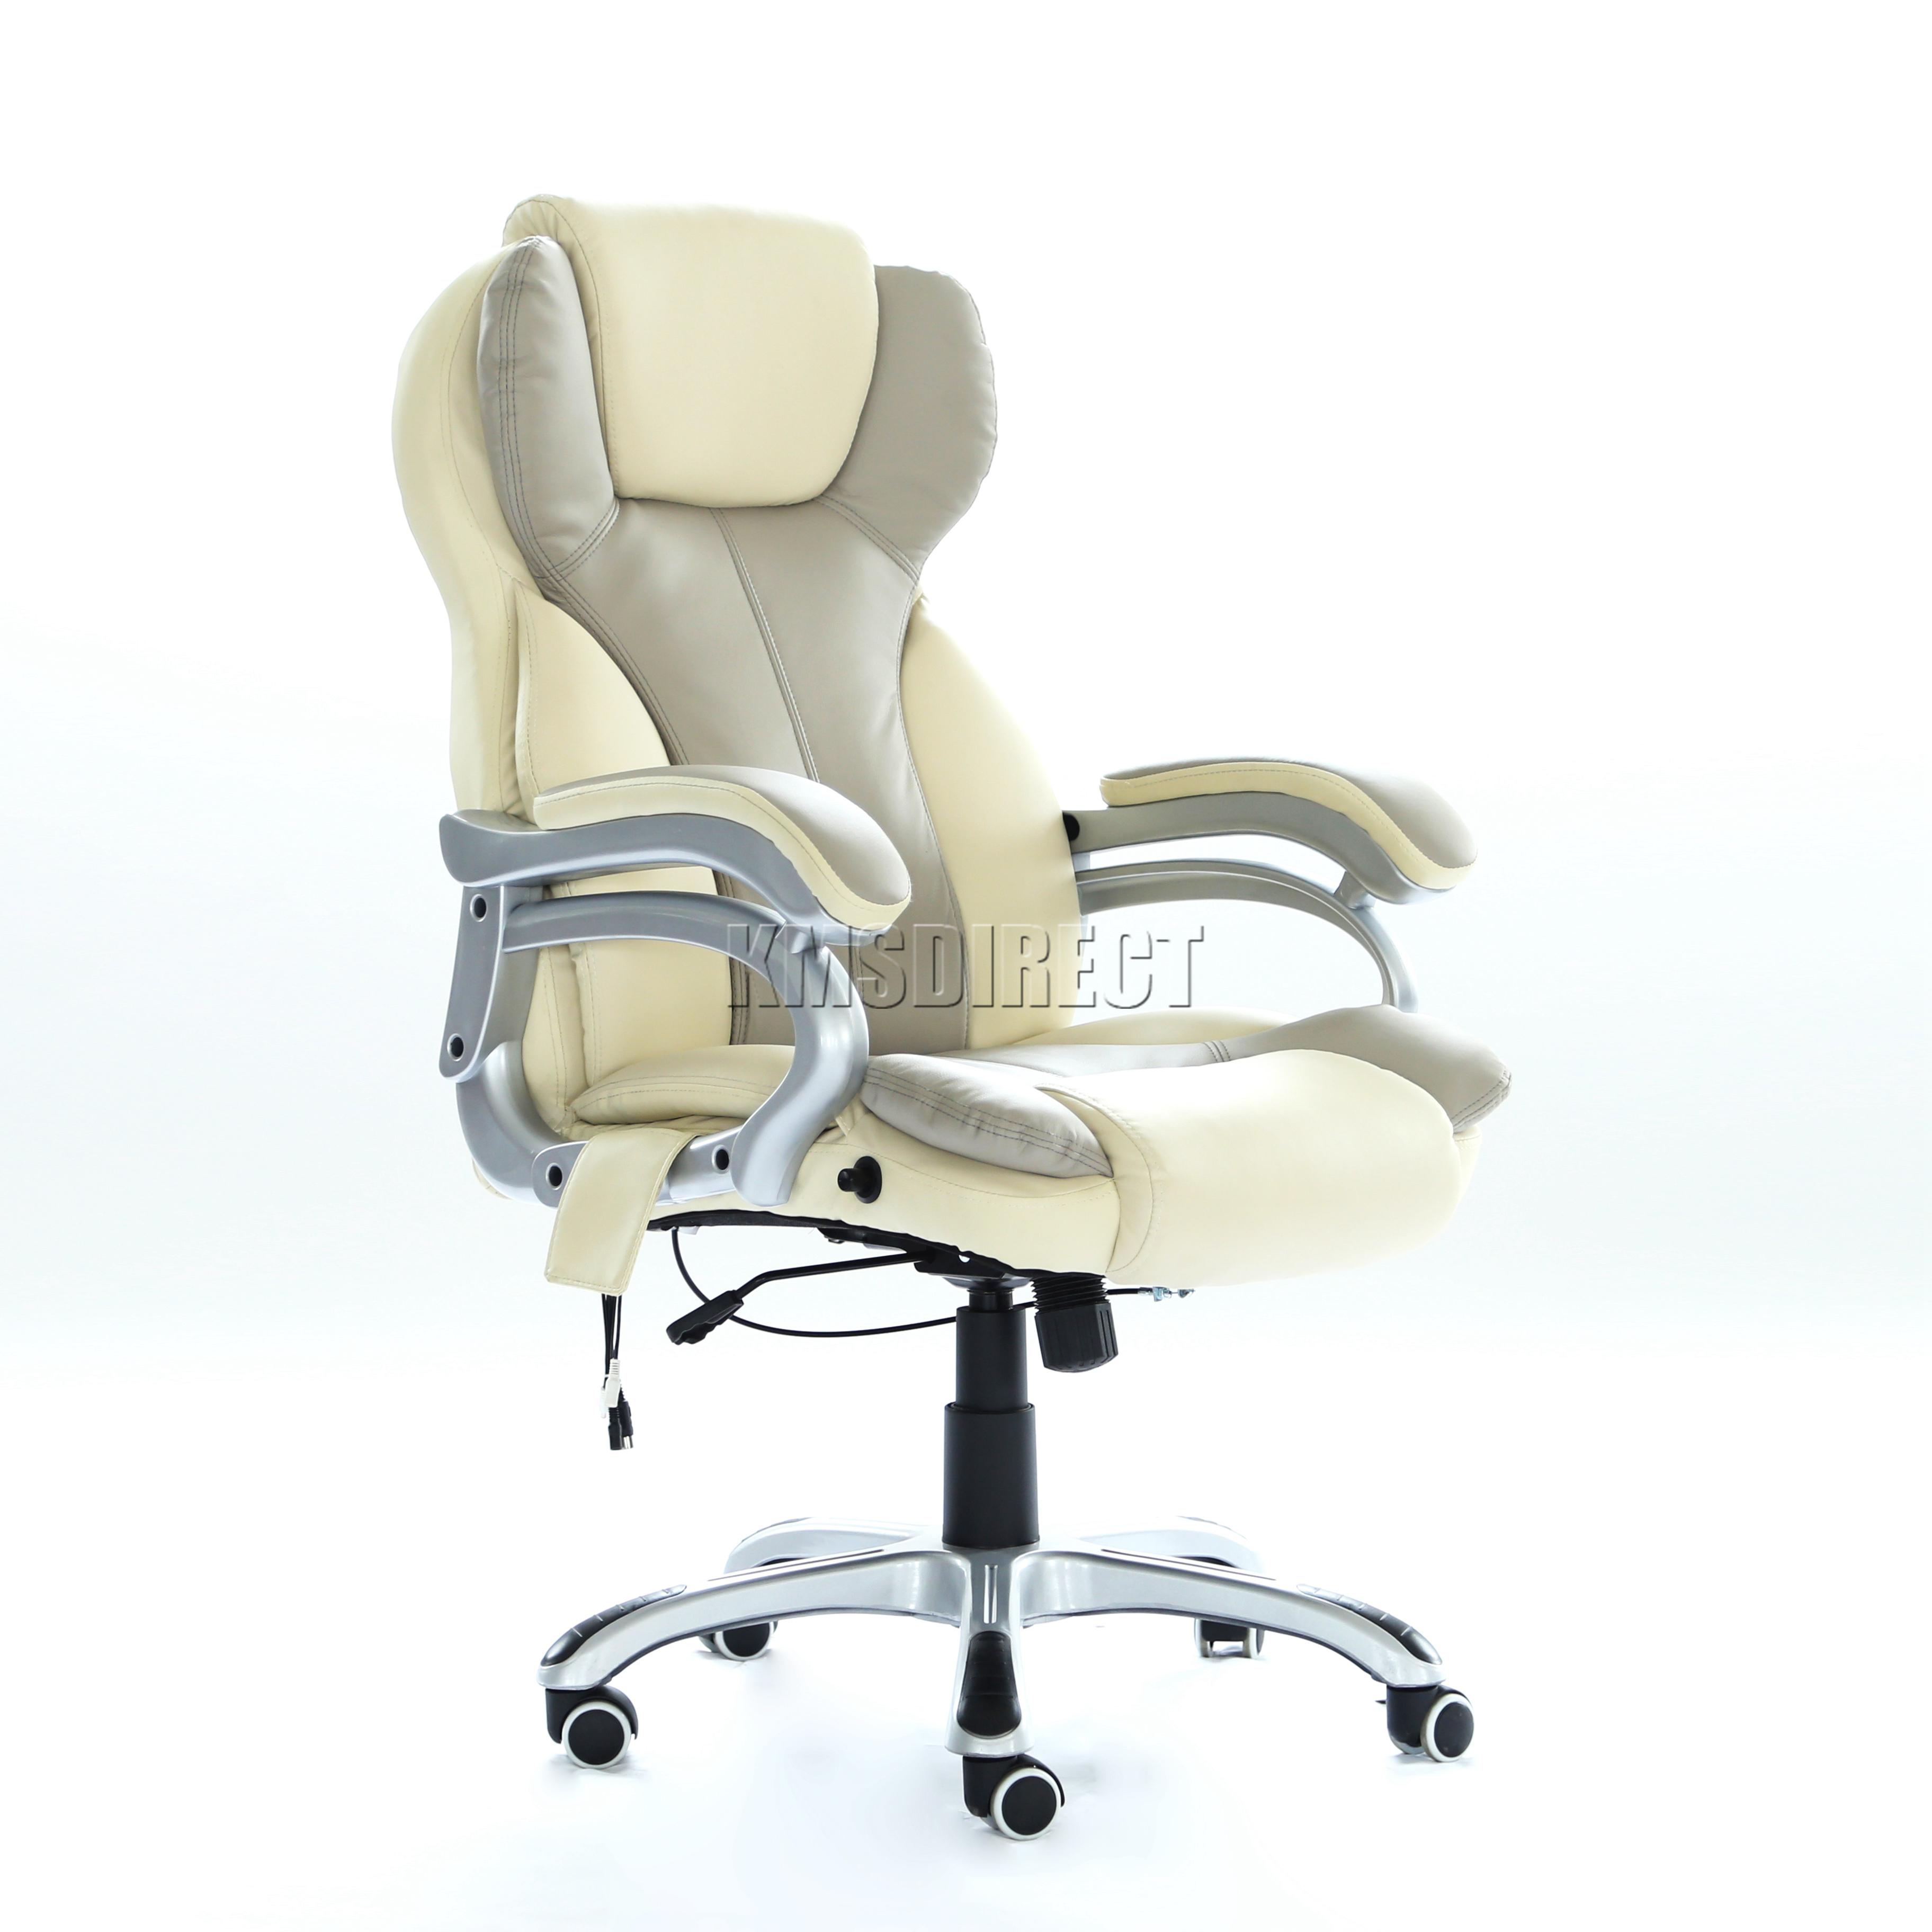 FoxHunter Luxury 6 Point Massage fice puter Chair Reclining